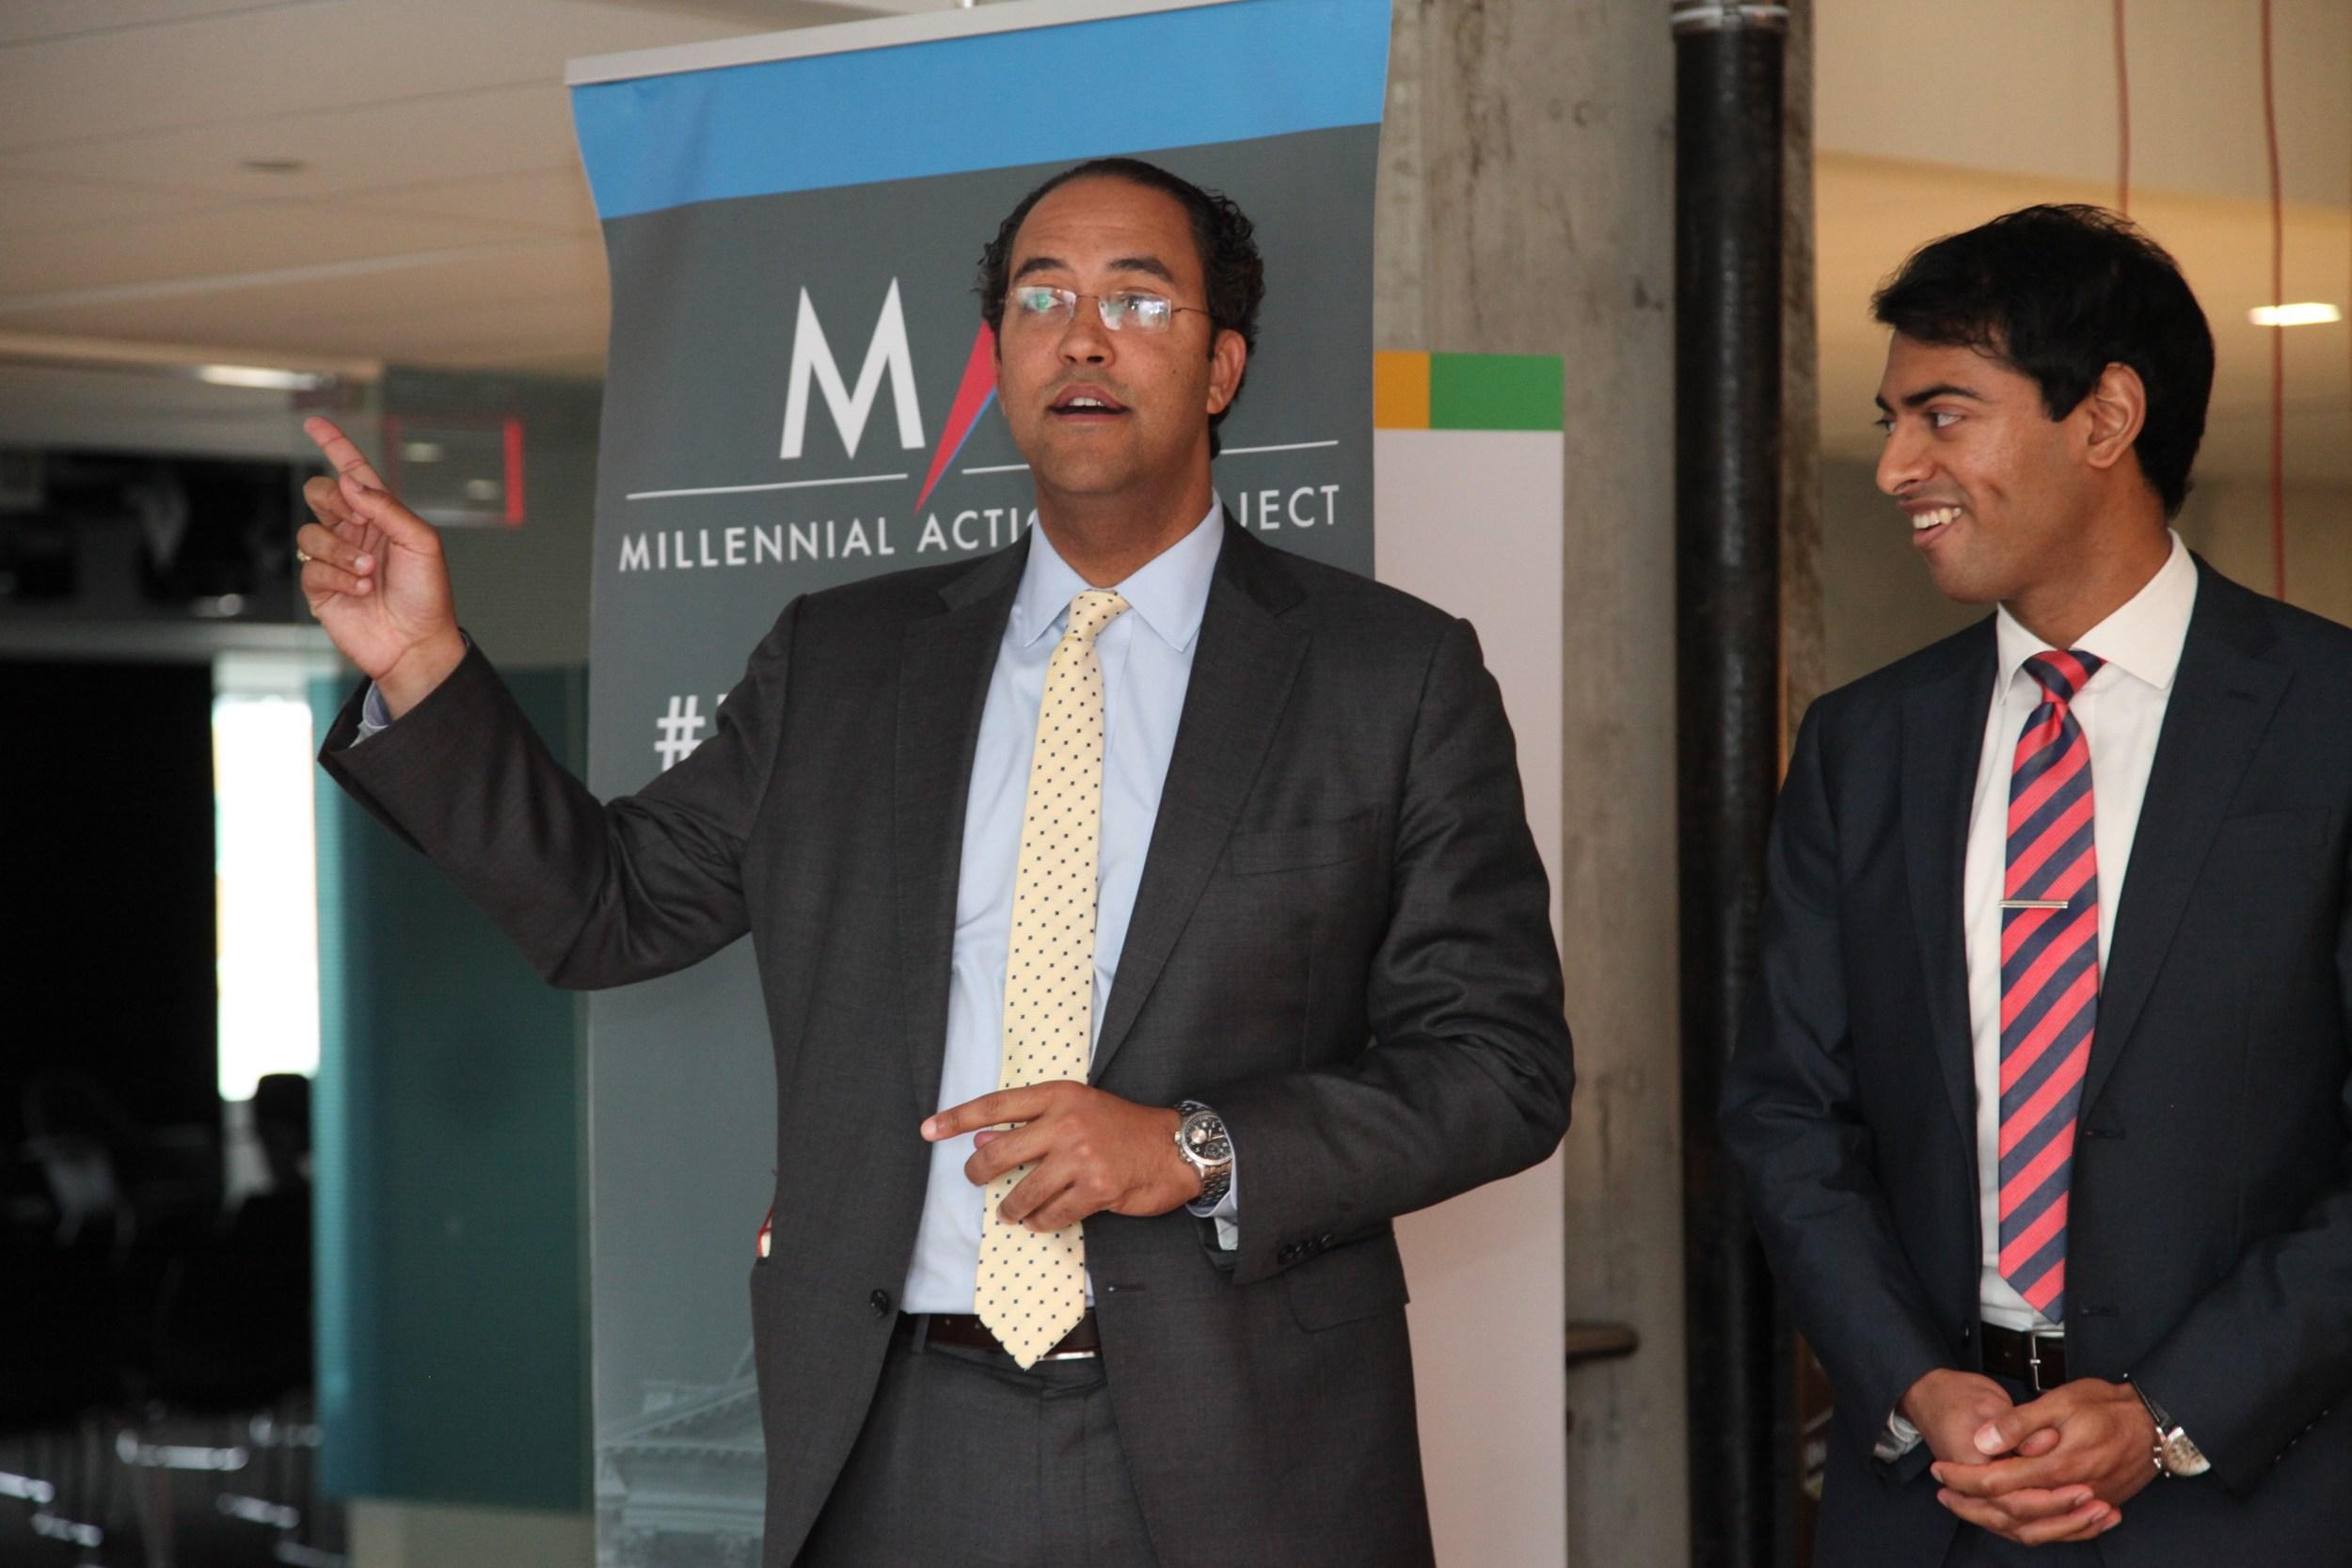 From left to right: Congressman Will Hurd addresses members of the public next to MAP President & Co-Founder Steven Olikara. © Liz Gorman